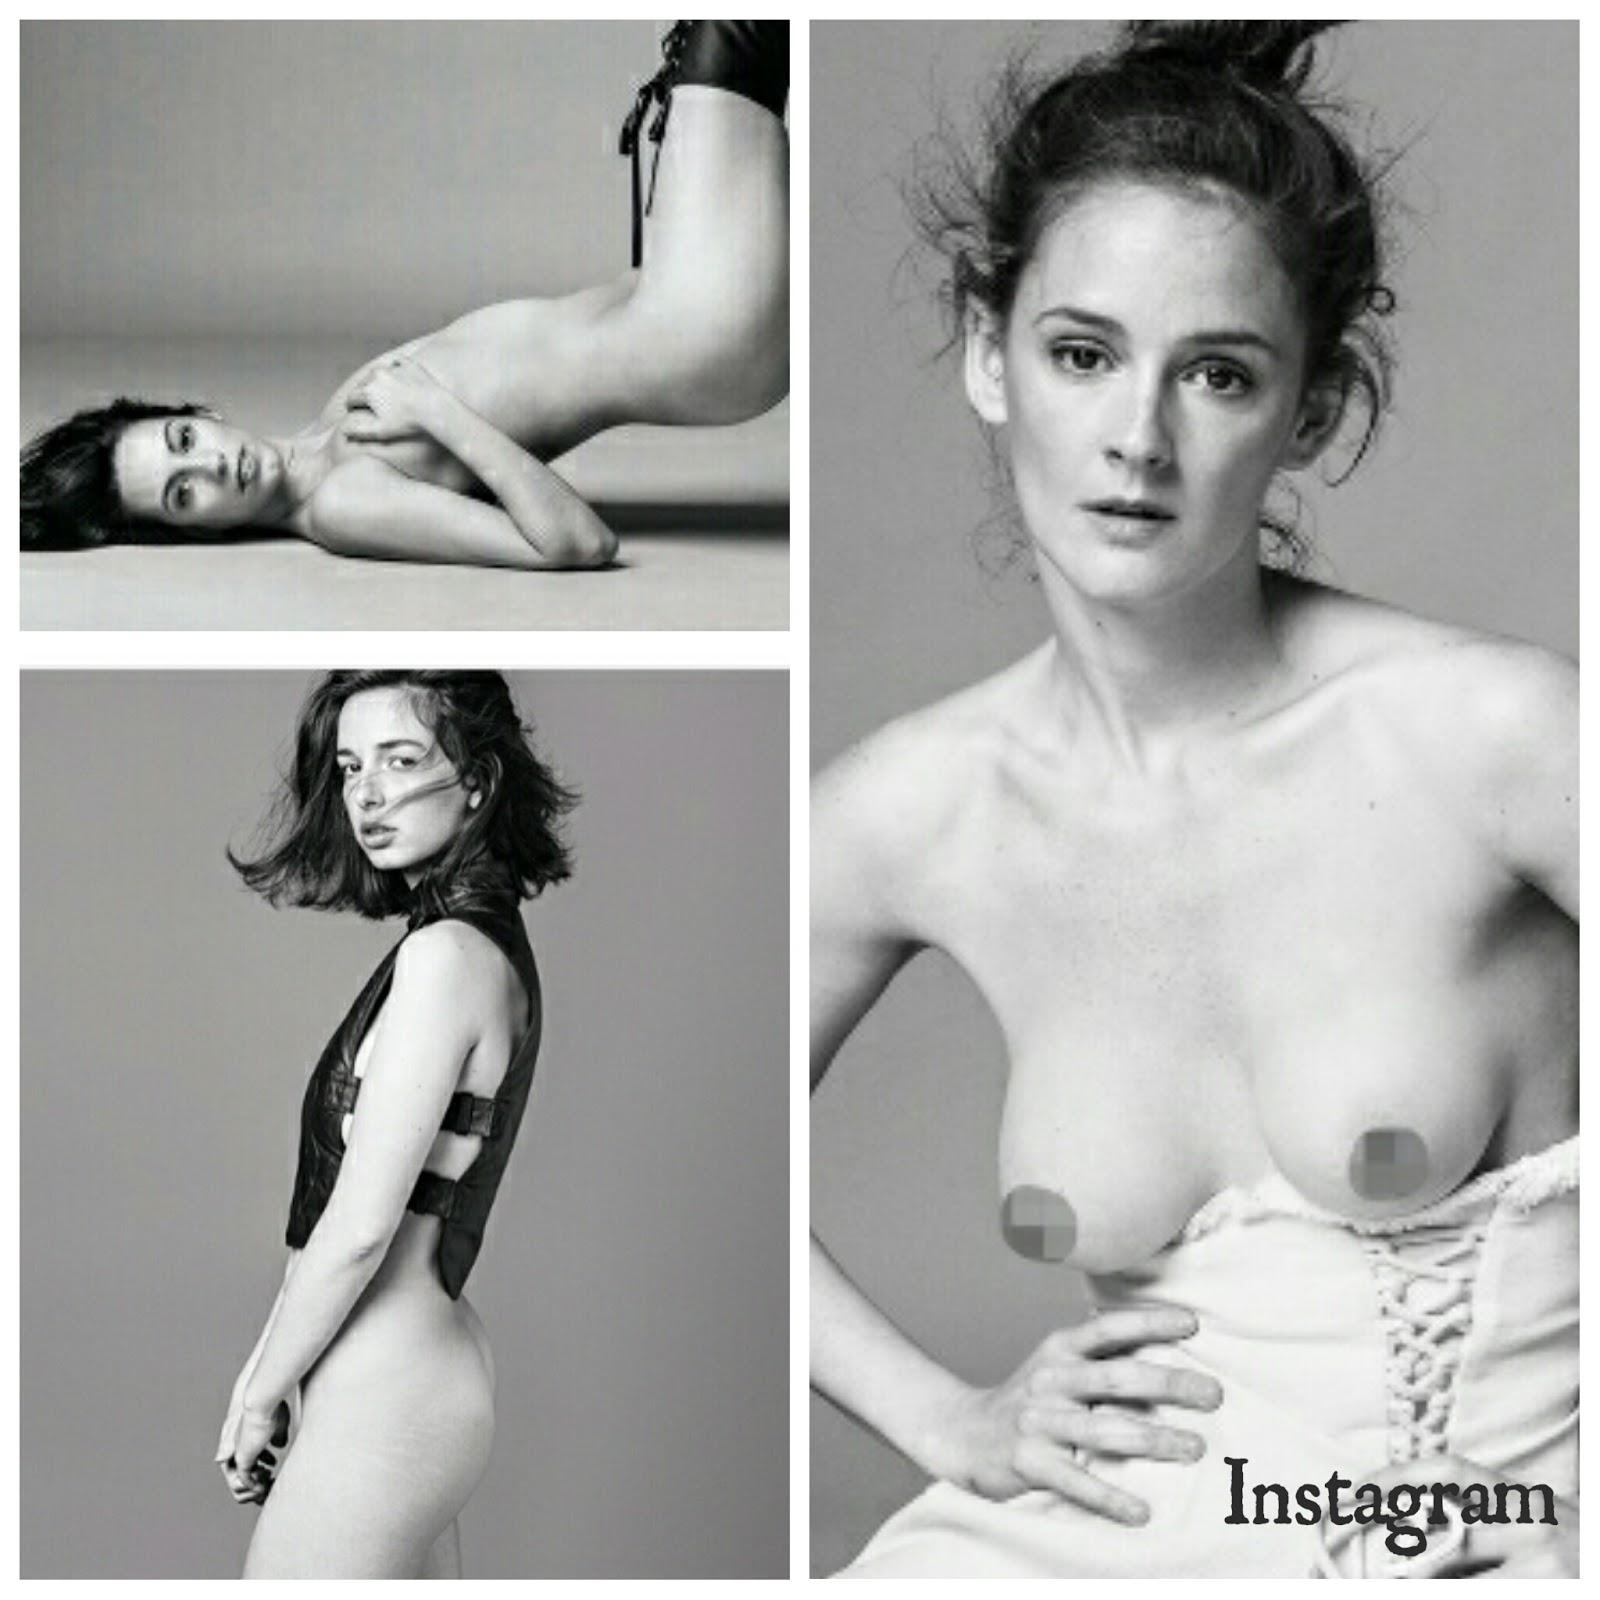 Almudena Cid Y Ana Polvorosa Desnudas Por La Libertad